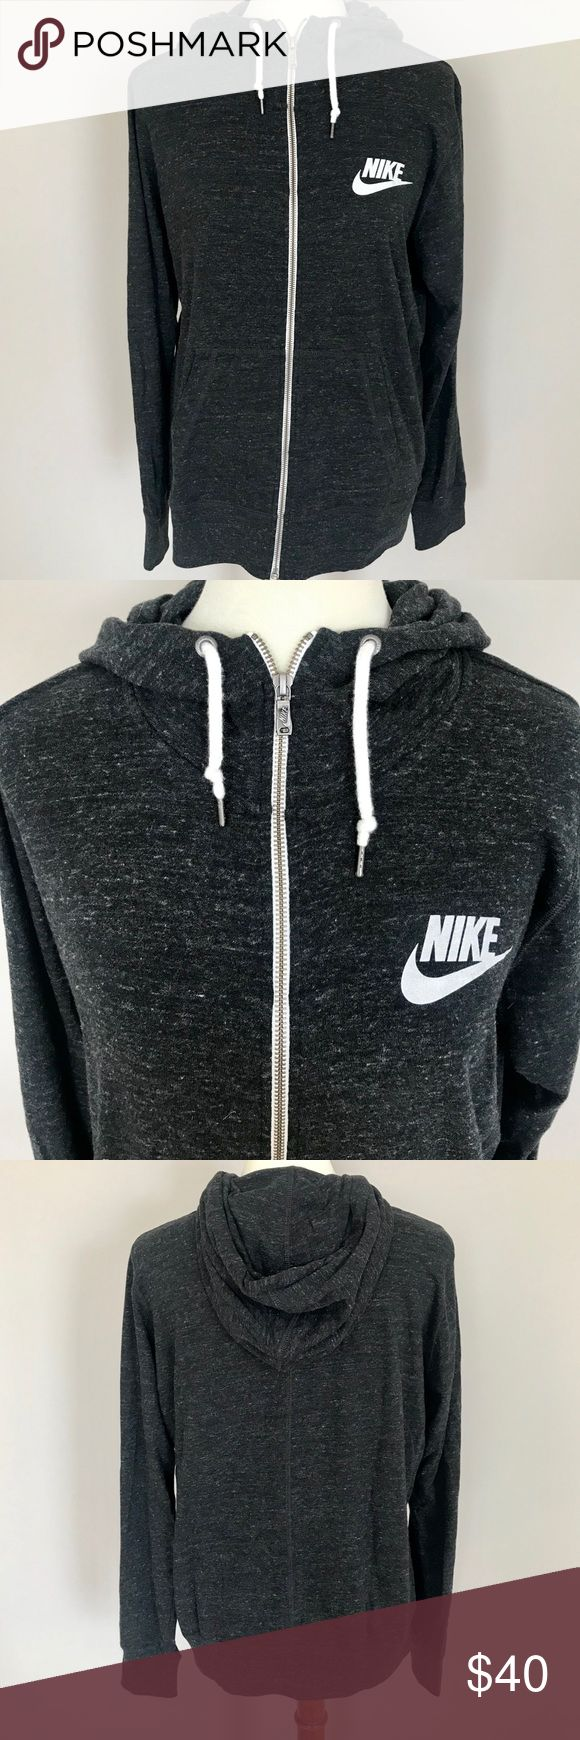 Nike Gray Flecked Hoodie Jacket- NWOT Nike Gray Flecked Hoodie Jacket- NWOT Gray hoodie flecked with white Zip-up Never worn, excellent condition Nike Tops Sweatshirts & Hoodies